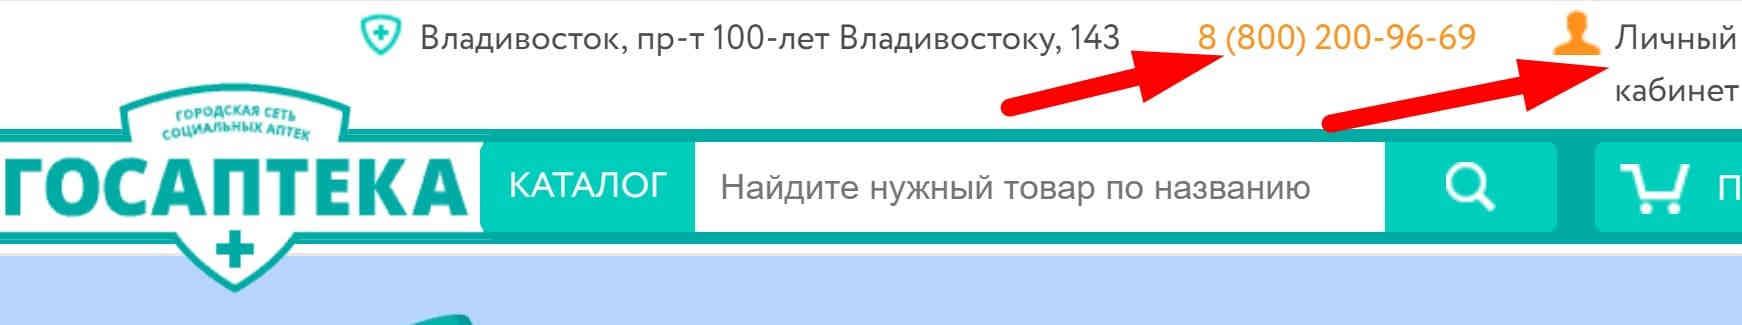 Госаптека Владивосток сайт